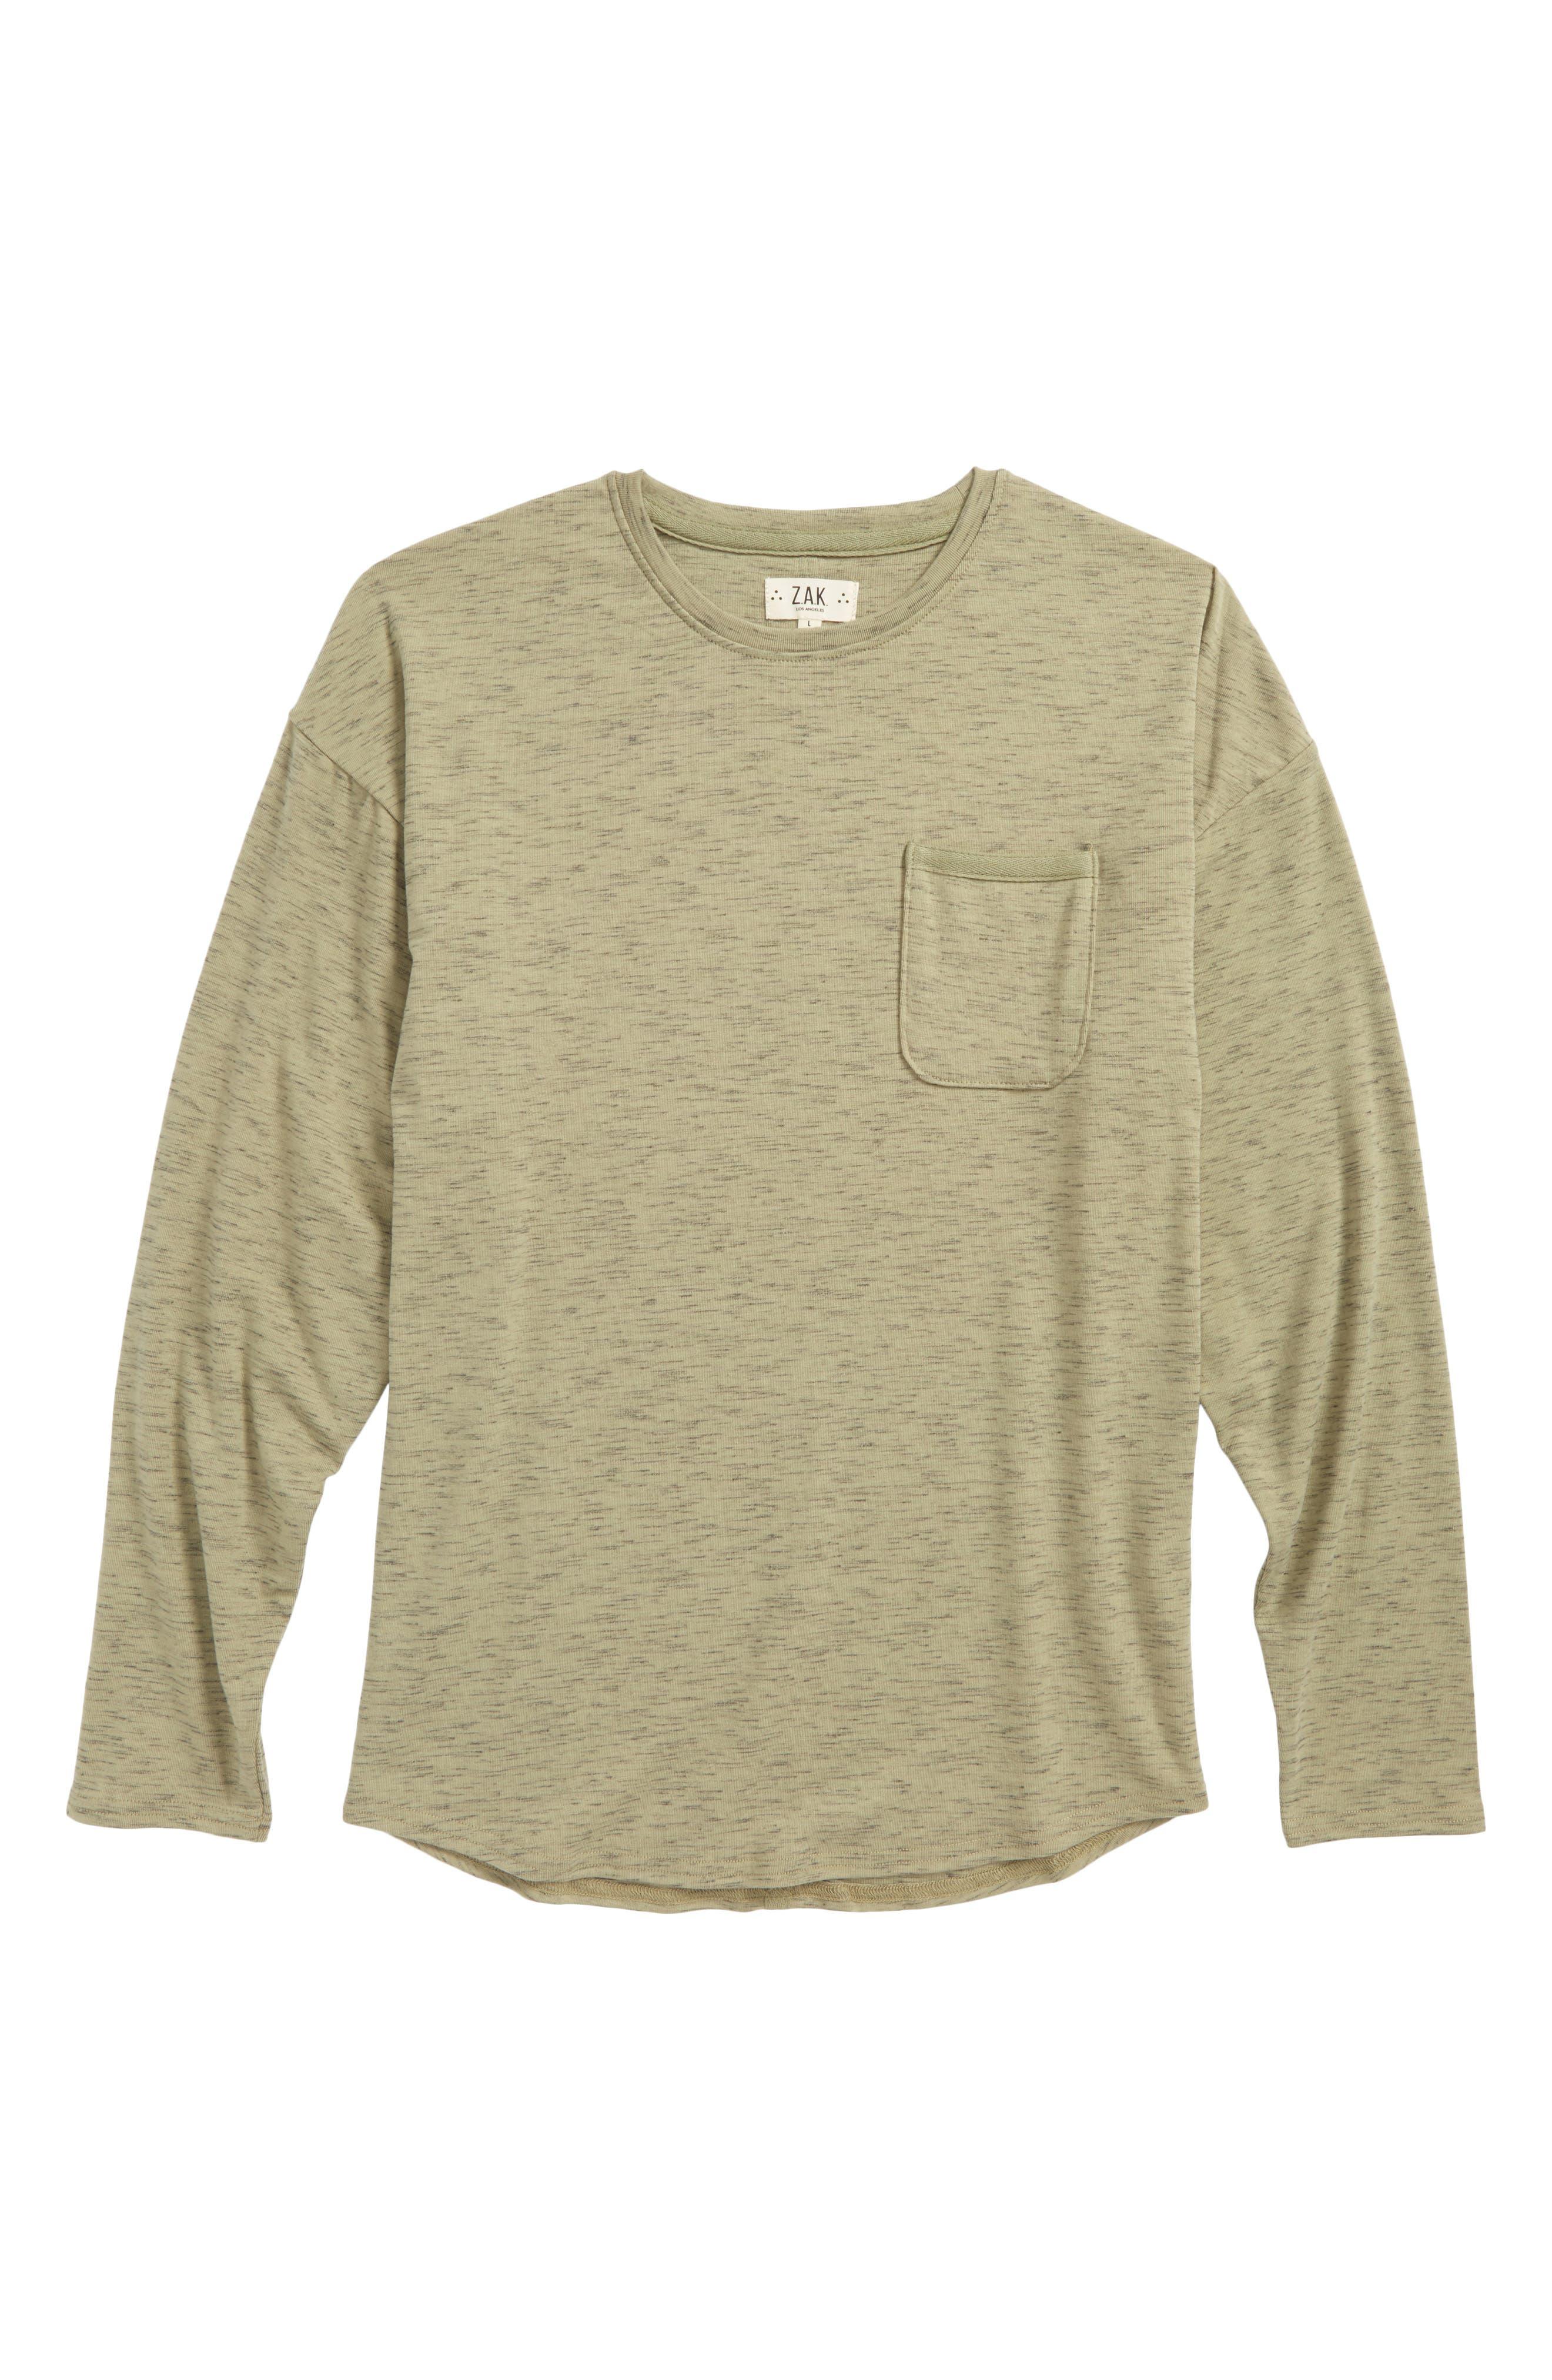 Main Image - Z.A.K. Brand The Mason Pocket T-Shirt (Big Boys)